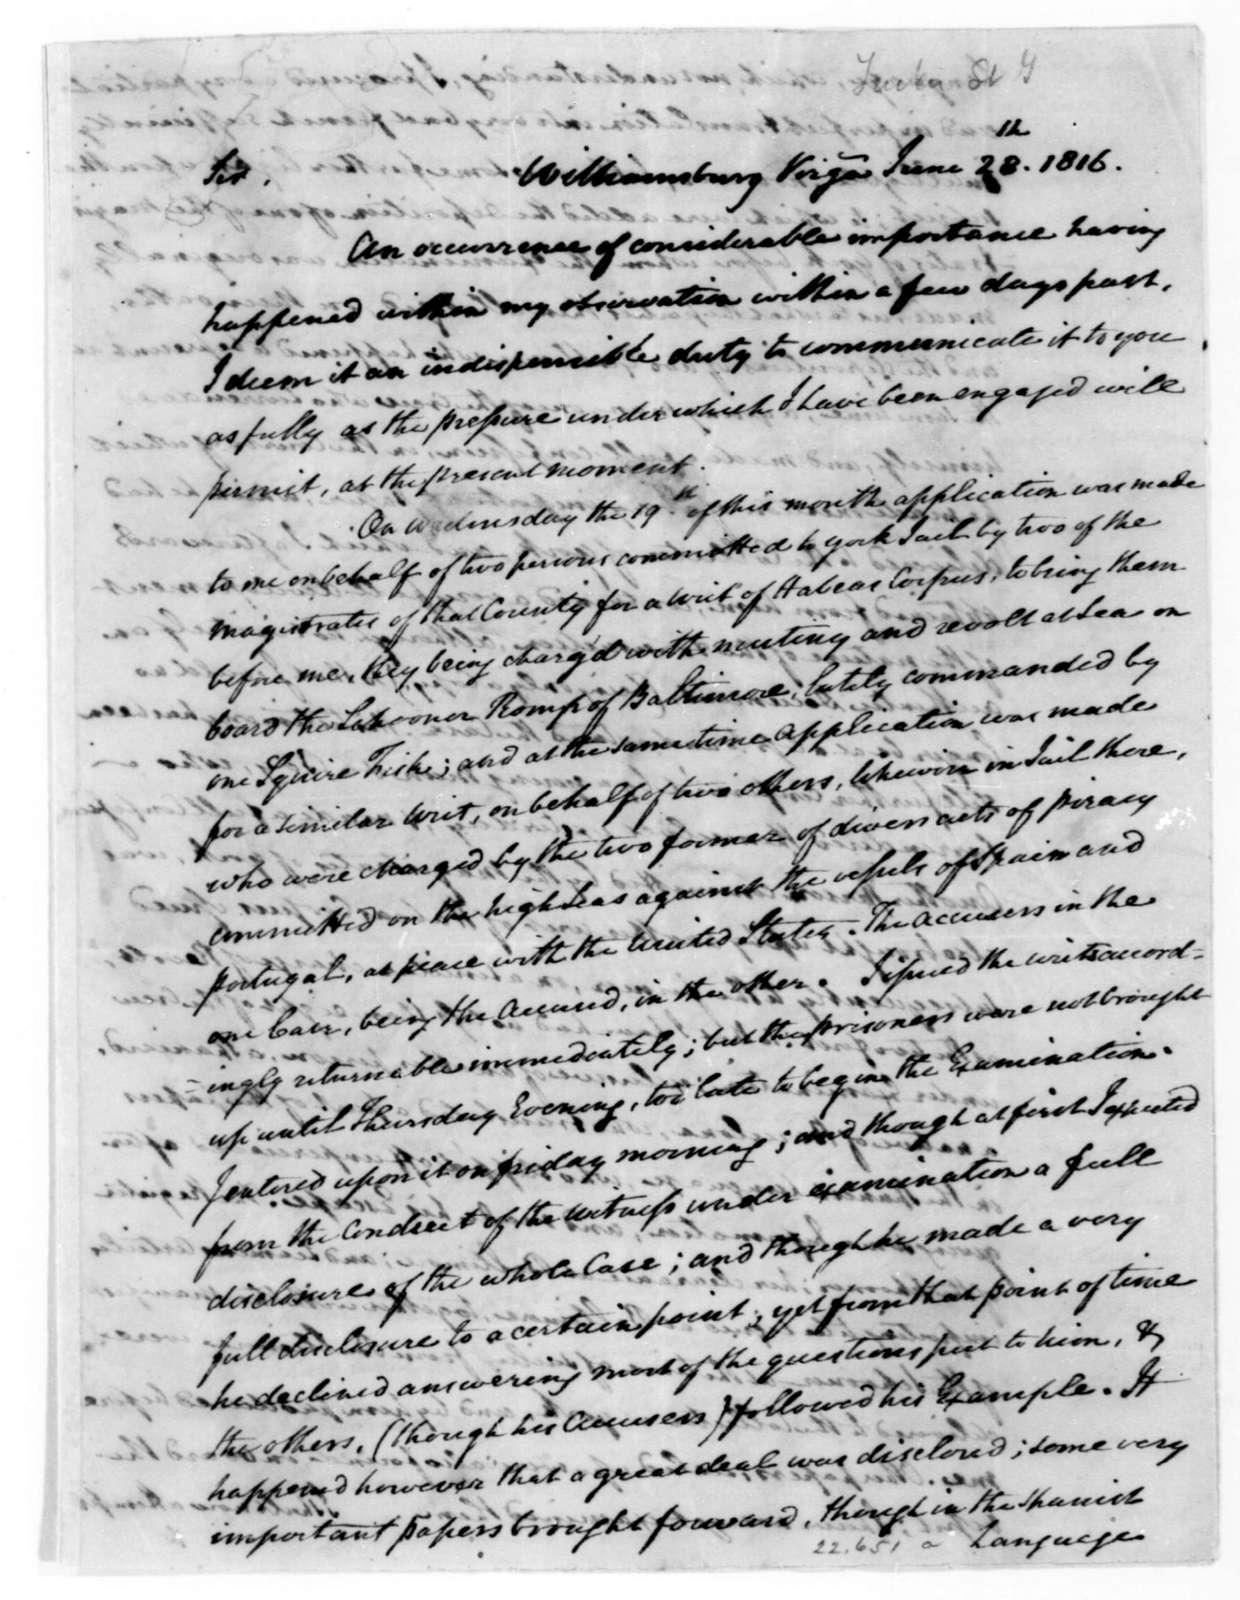 St. George Tucker to James Madison, June 28, 1816.